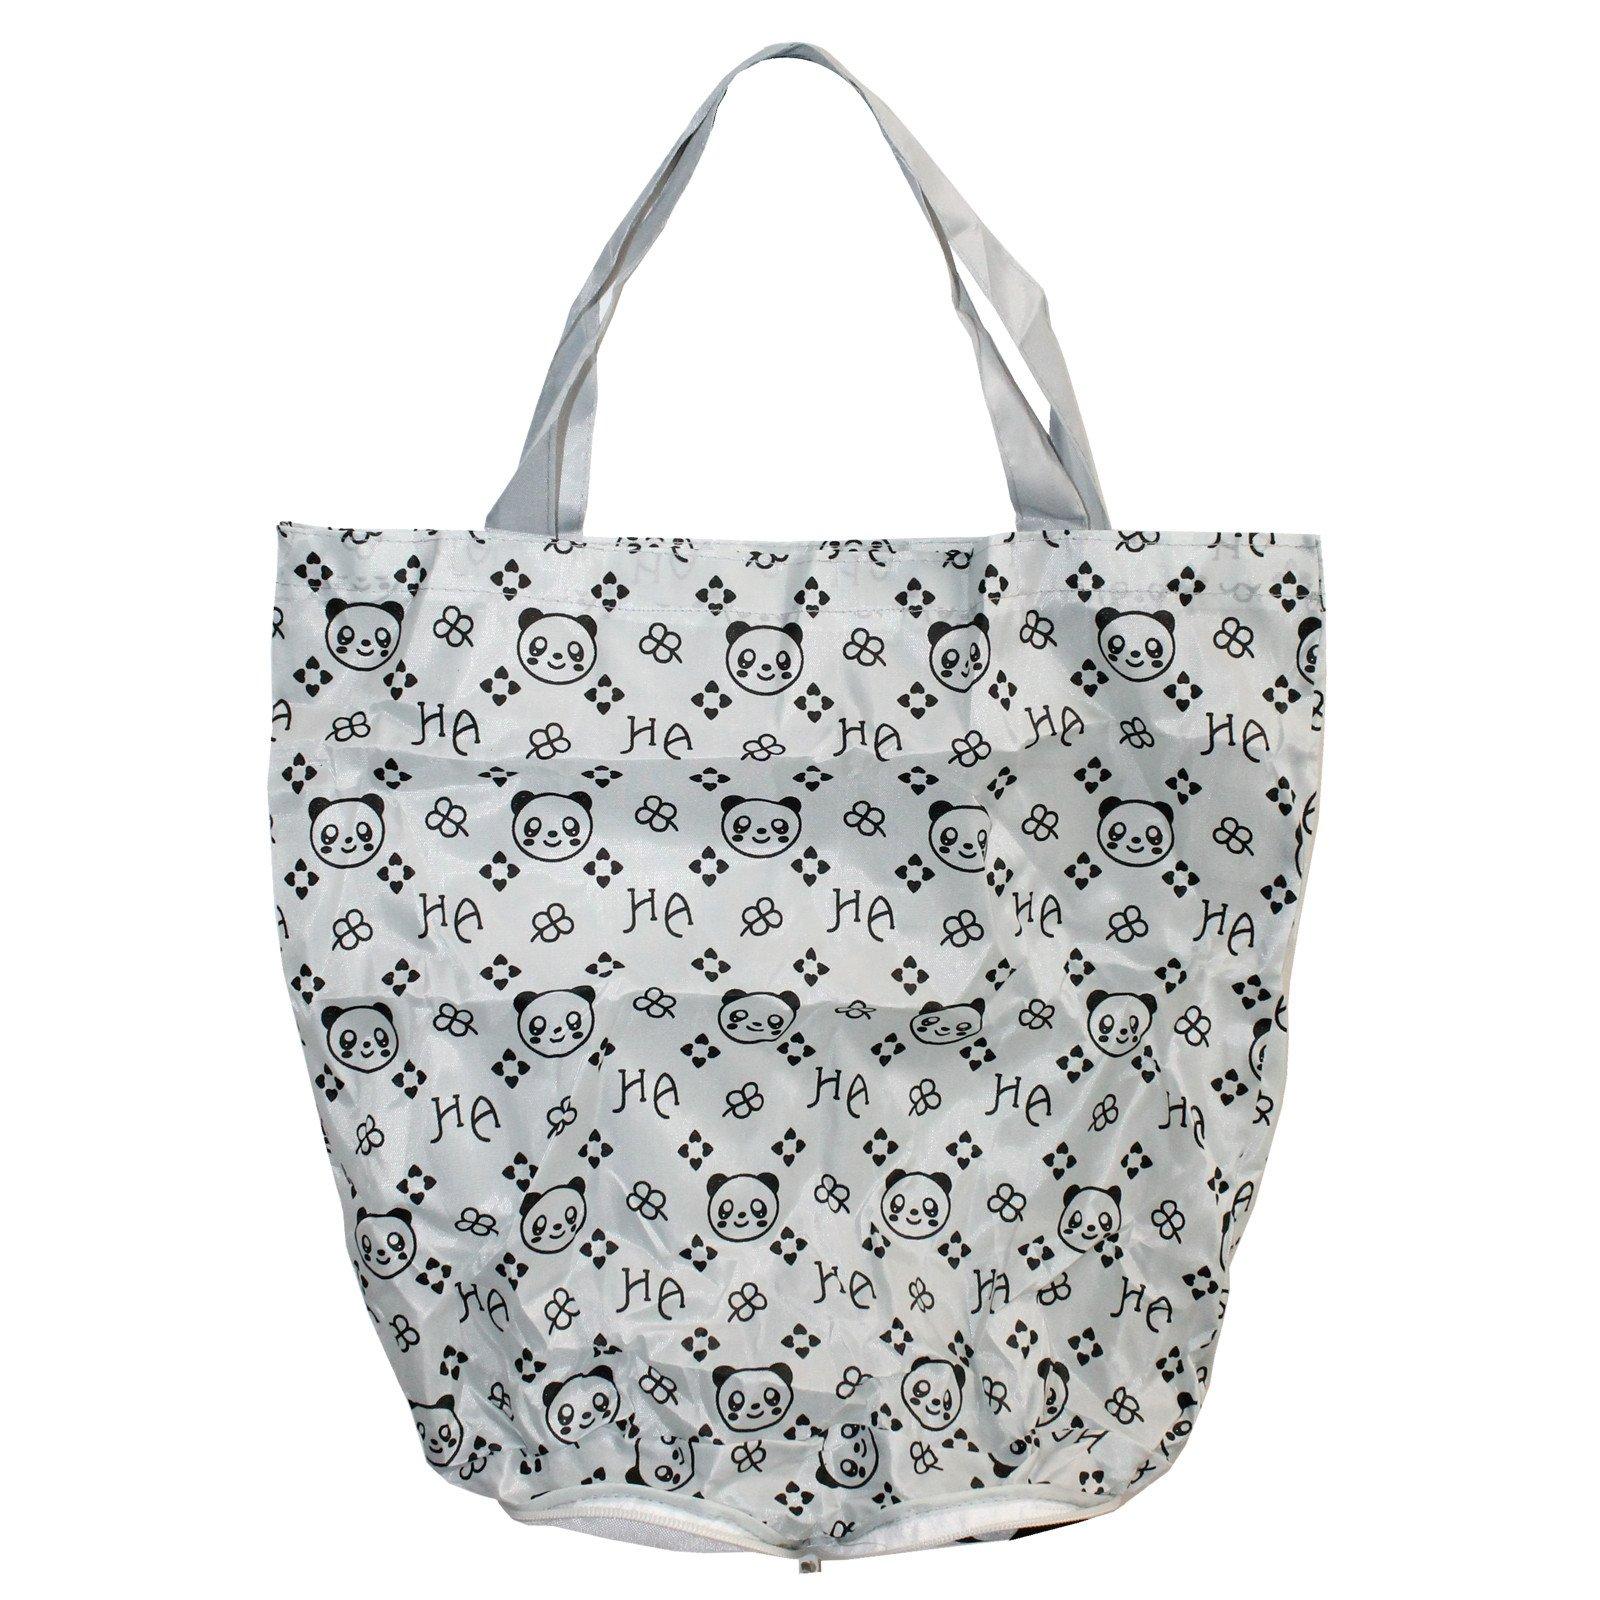 1600x1600 Panda Bear White Foldable Shopping Bag W Zipper Ufindings, Inc.